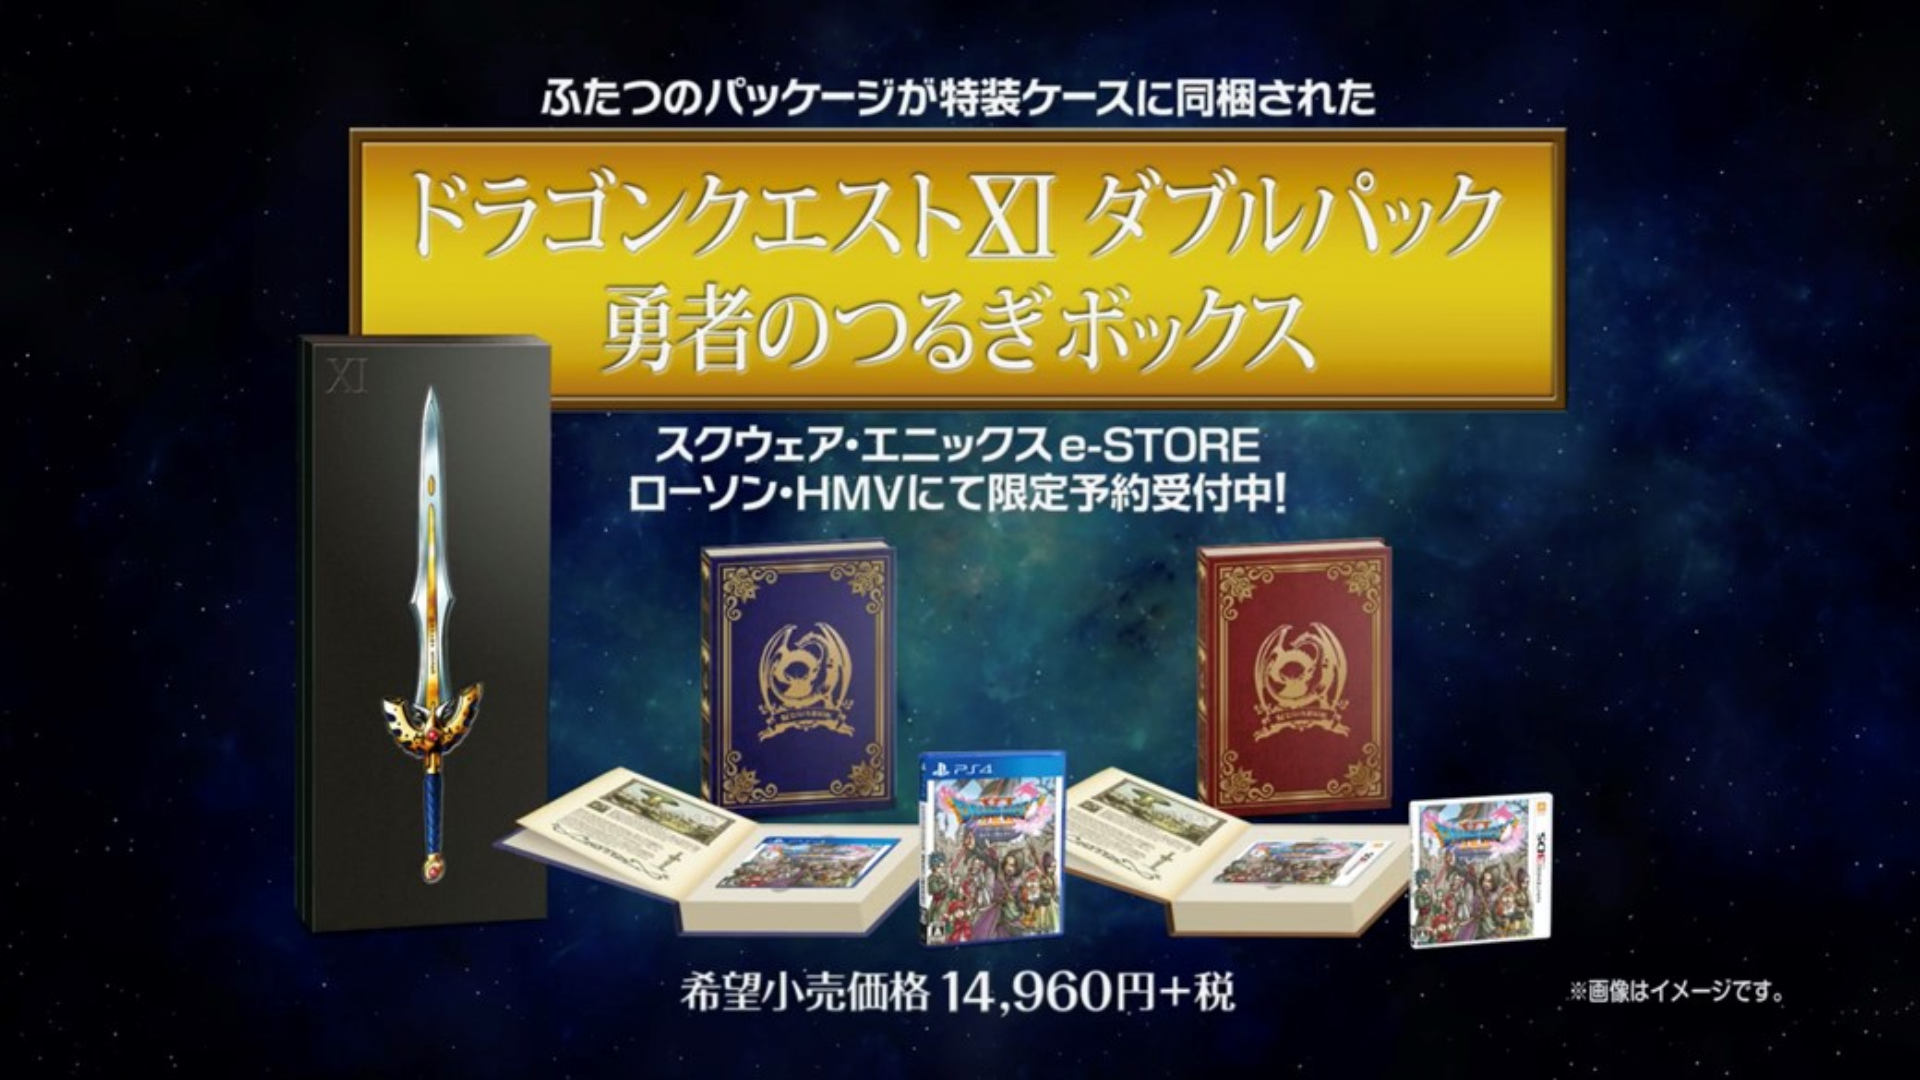 Square Enix vai oferecer pacote com Dragon Quest XI de PS4 e 3DS